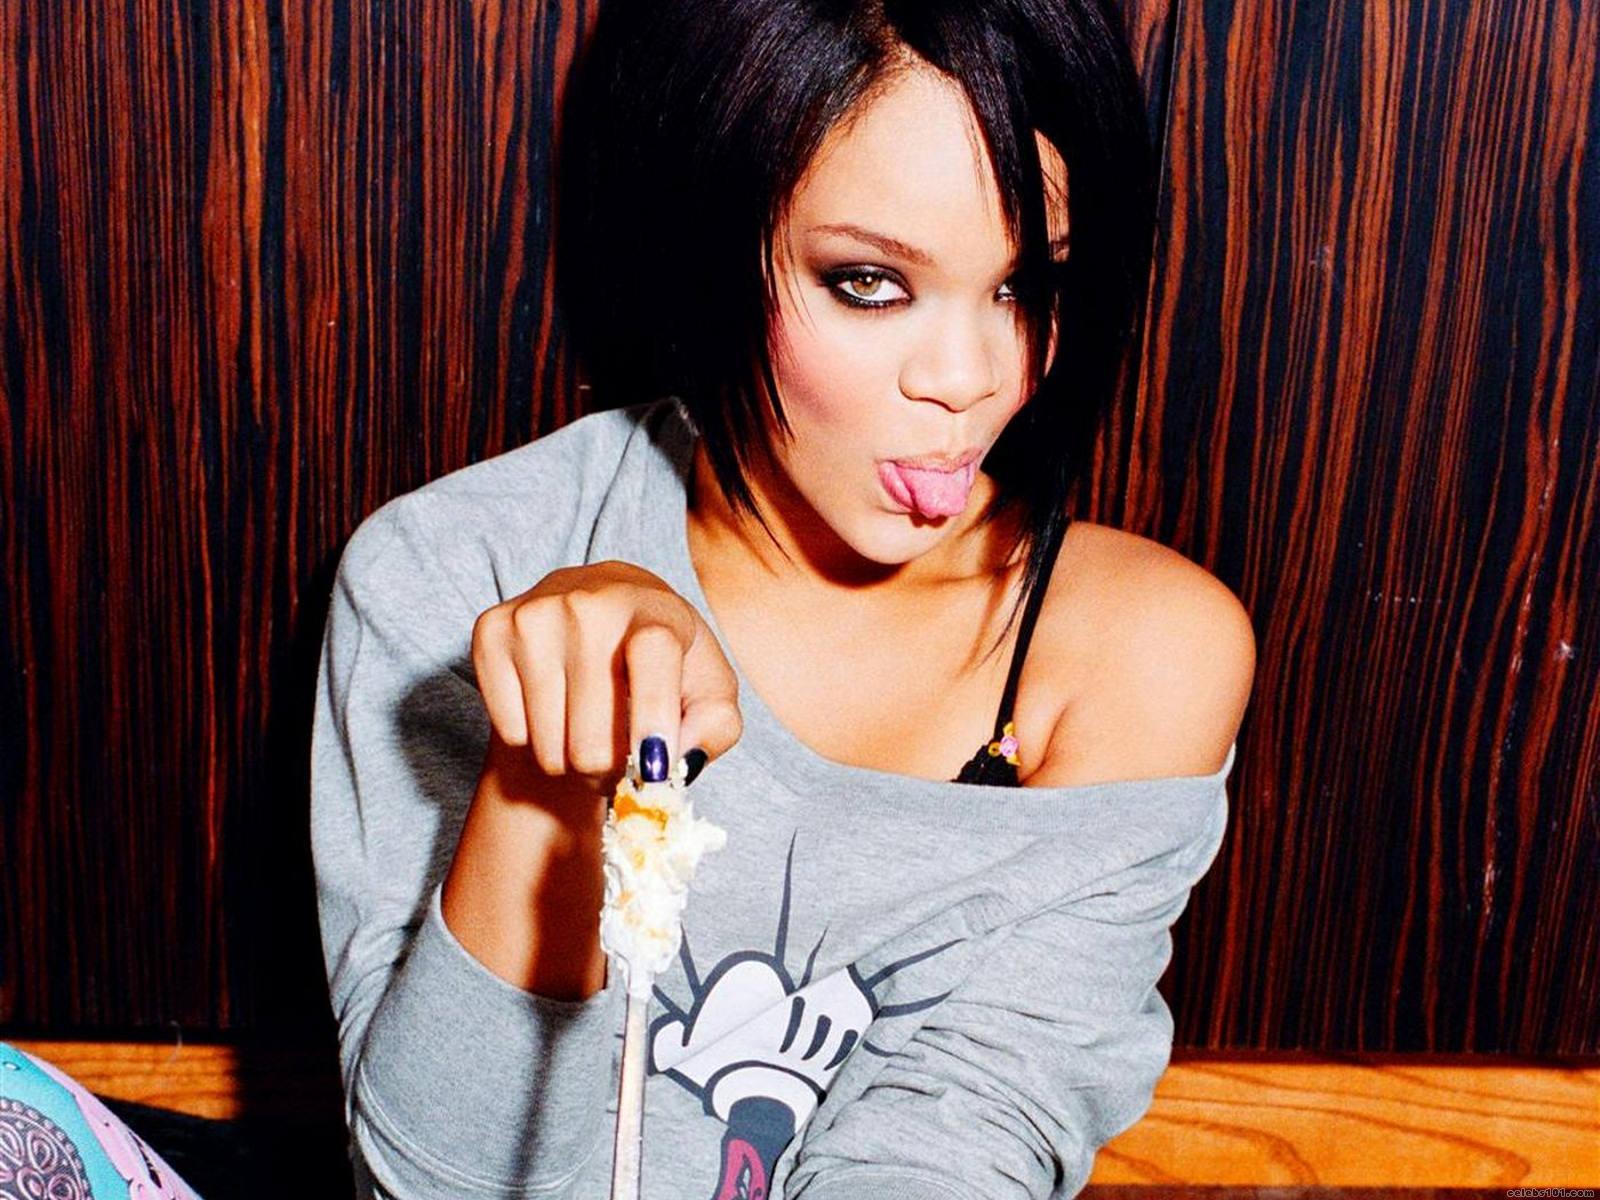 Rihanna Hollywood Star Latest Hd Wallpapers 2013 Hollywood Stars Hd 1600x1200